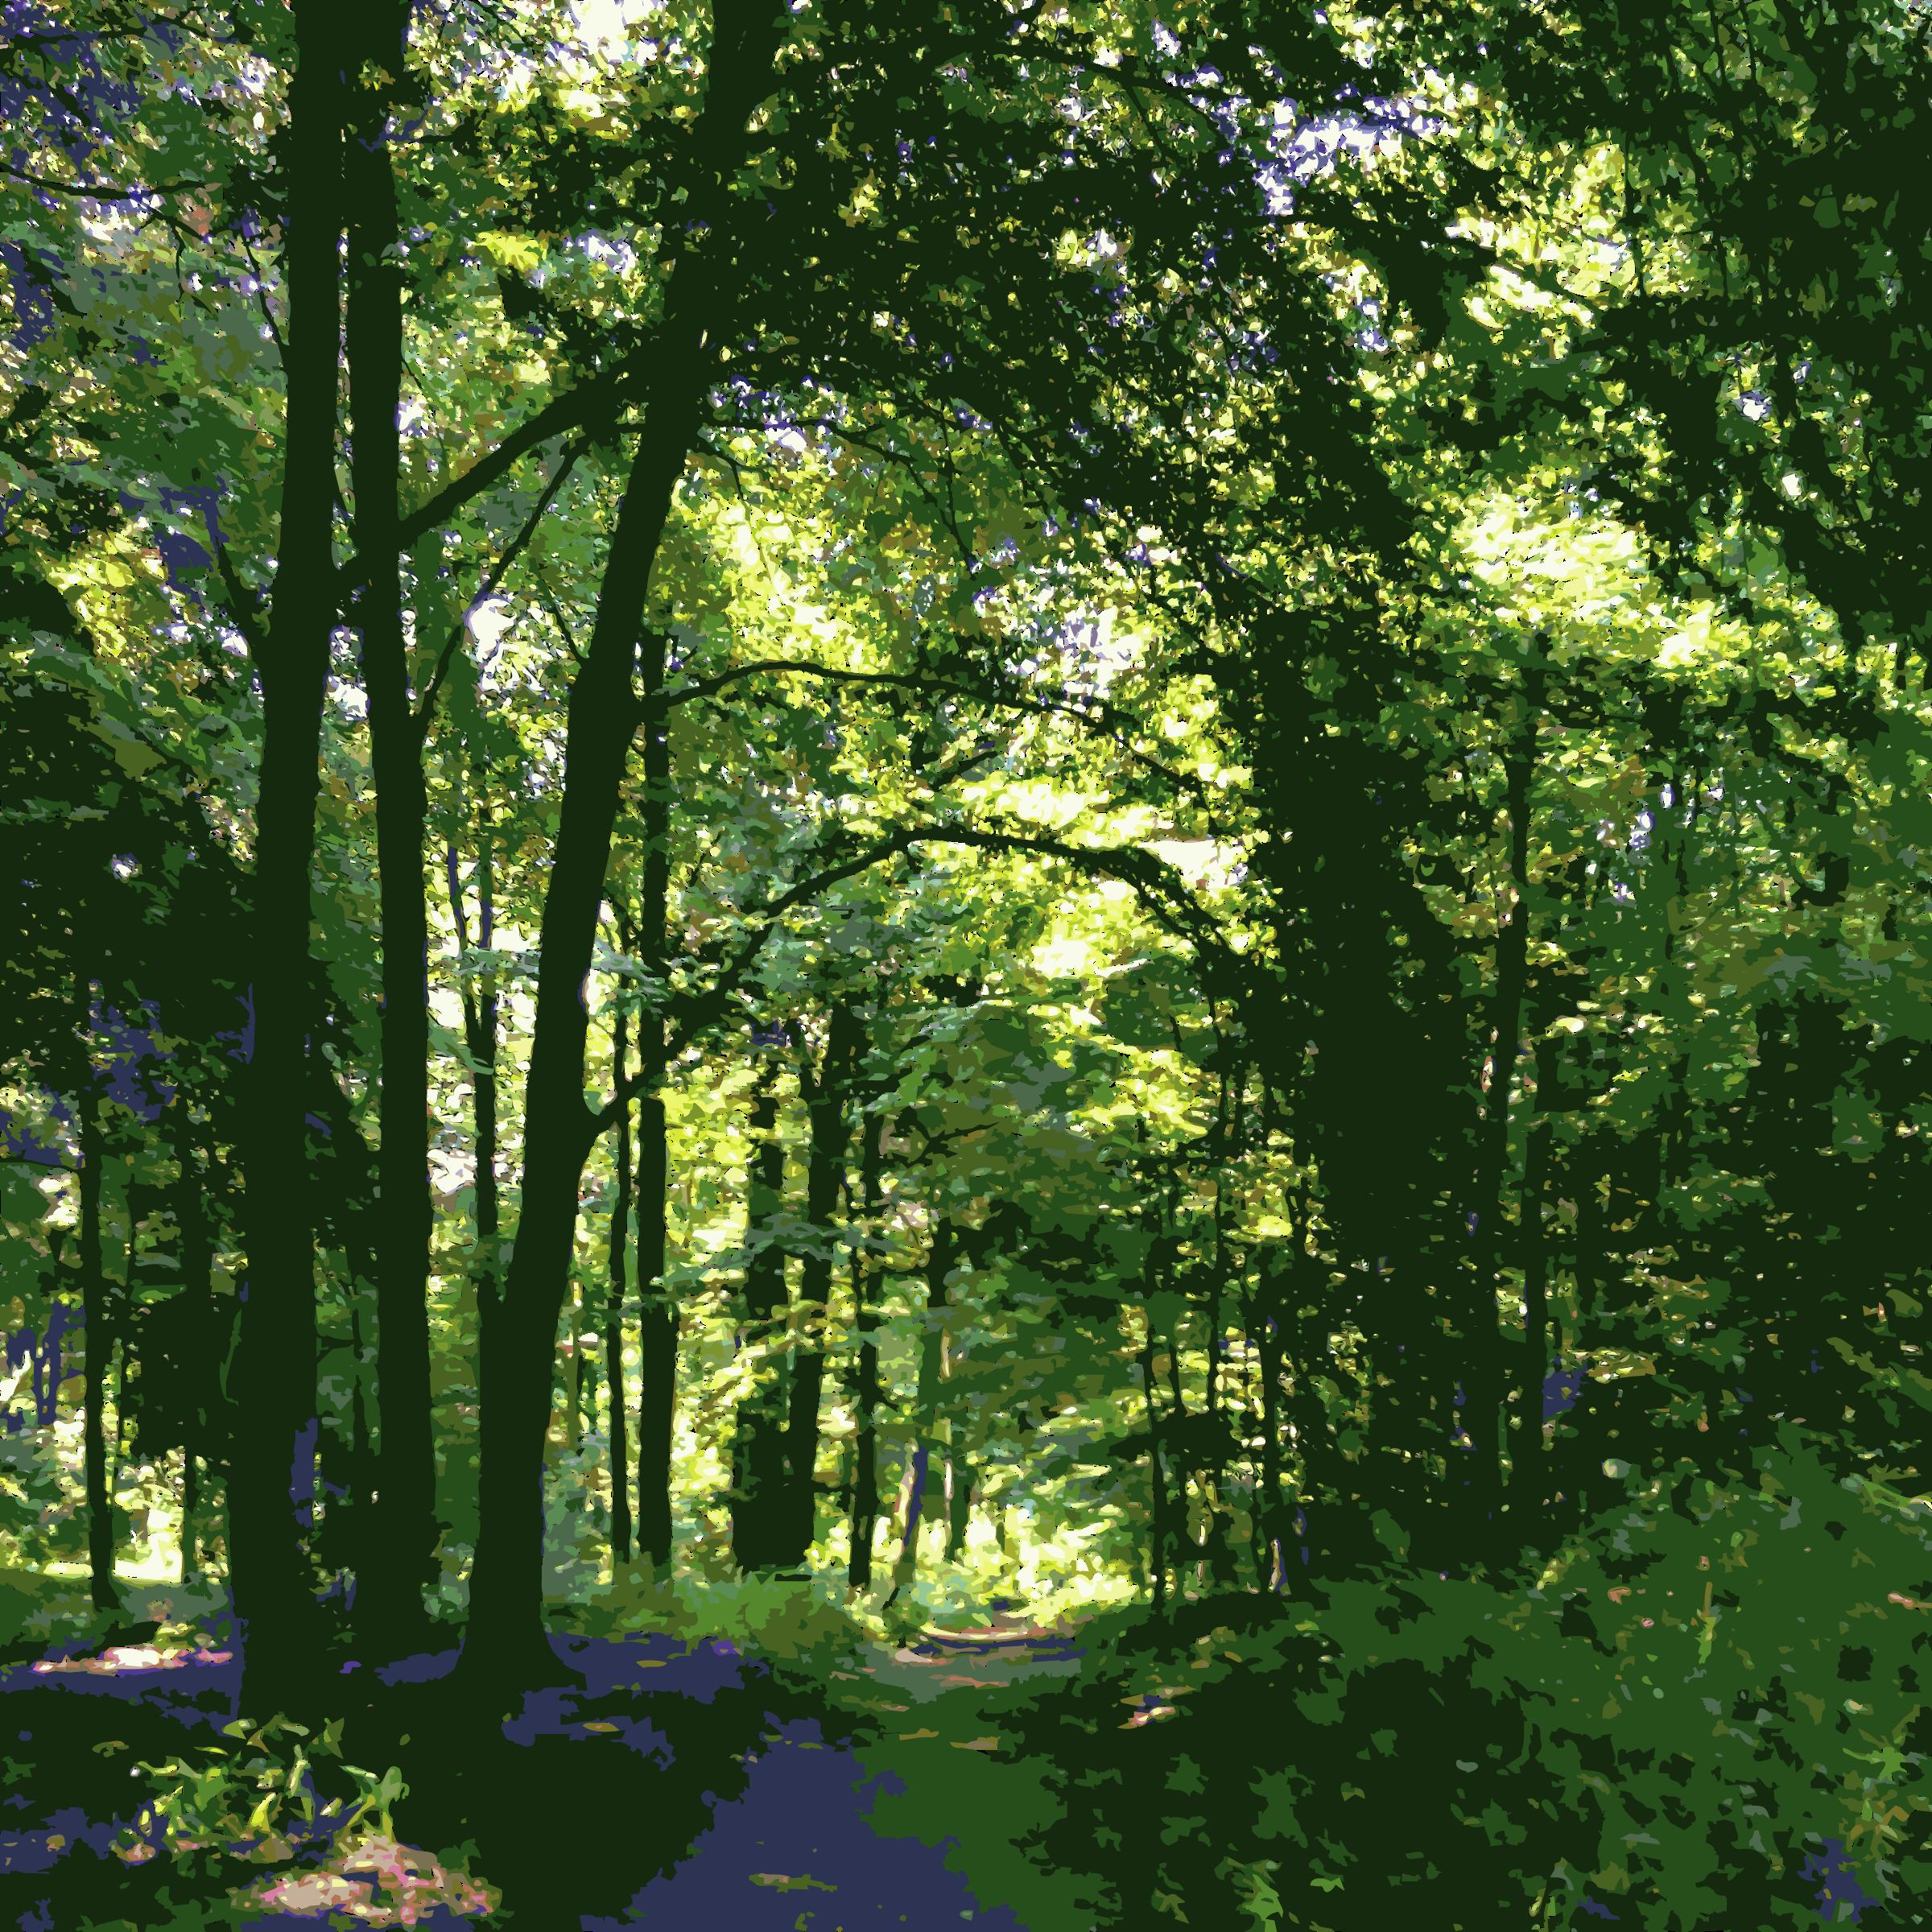 Landscape clipart forest. Shortcut big image png